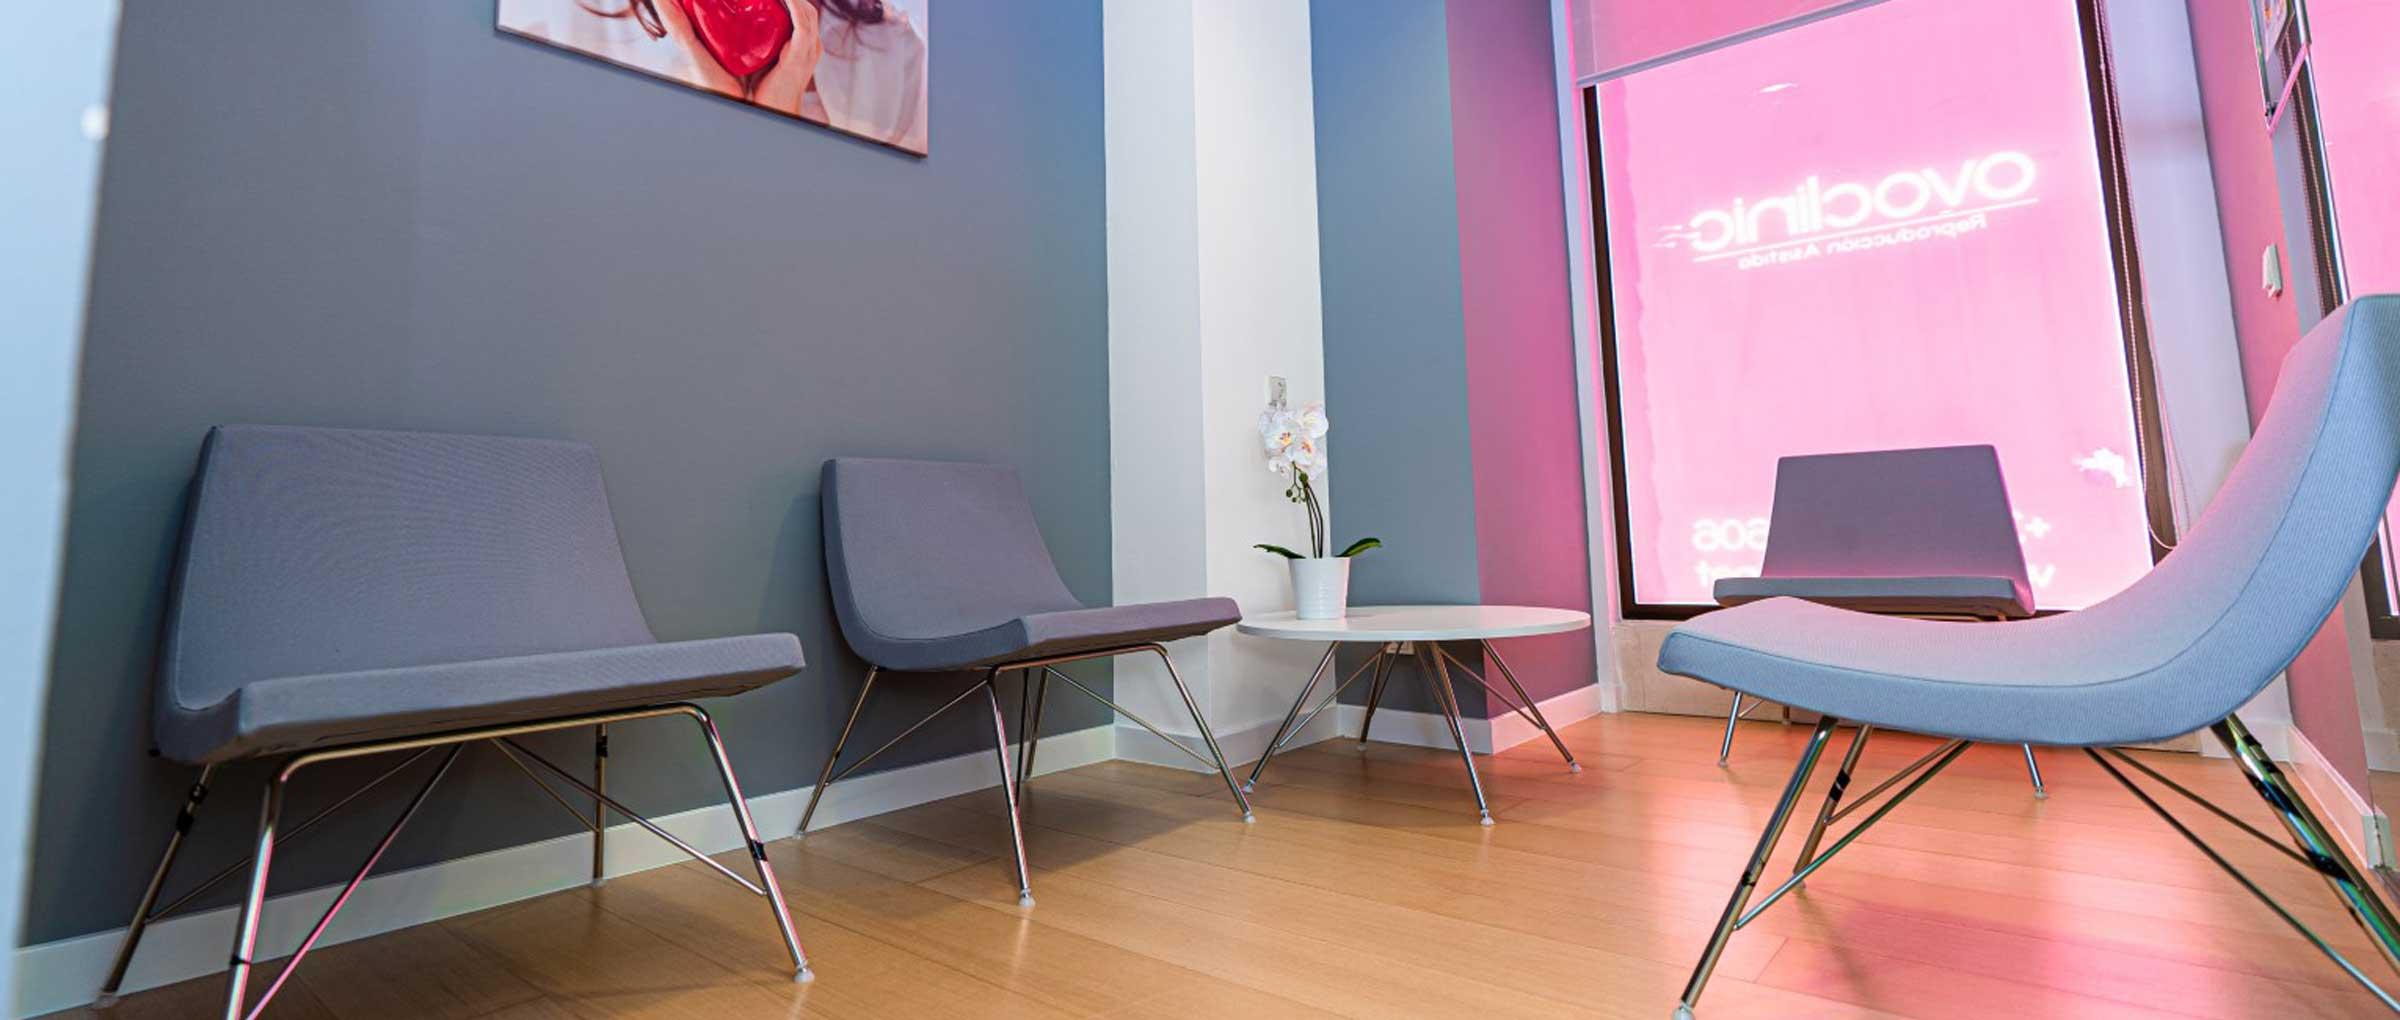 Sala de espera para donantes de gametos